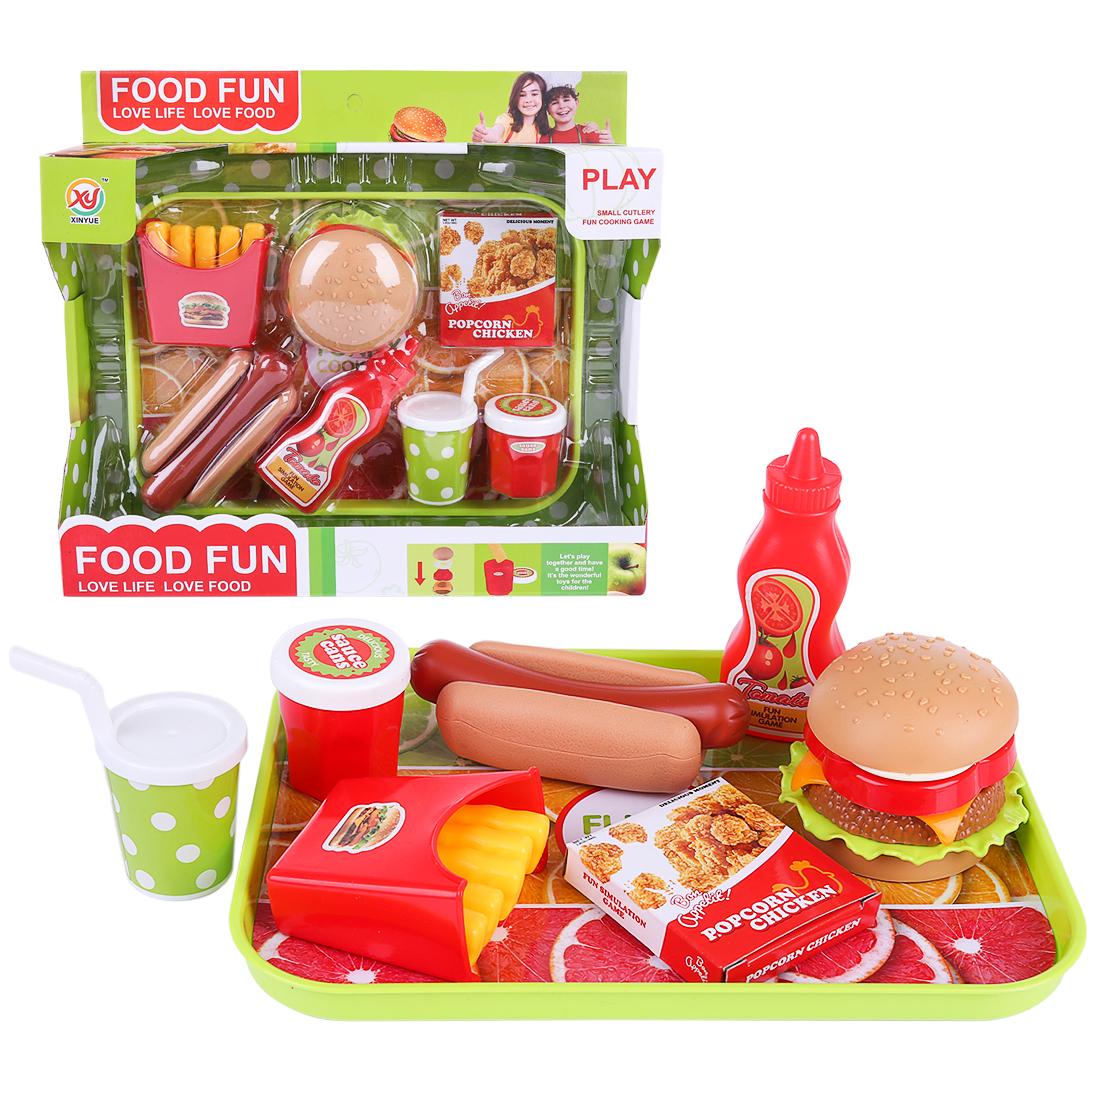 Kids Pretend Play Miniature Fun Kitchen Plastic Food Hamburger Fast Food Playset Educational Toys For Children Kids Gift 3 Sizes